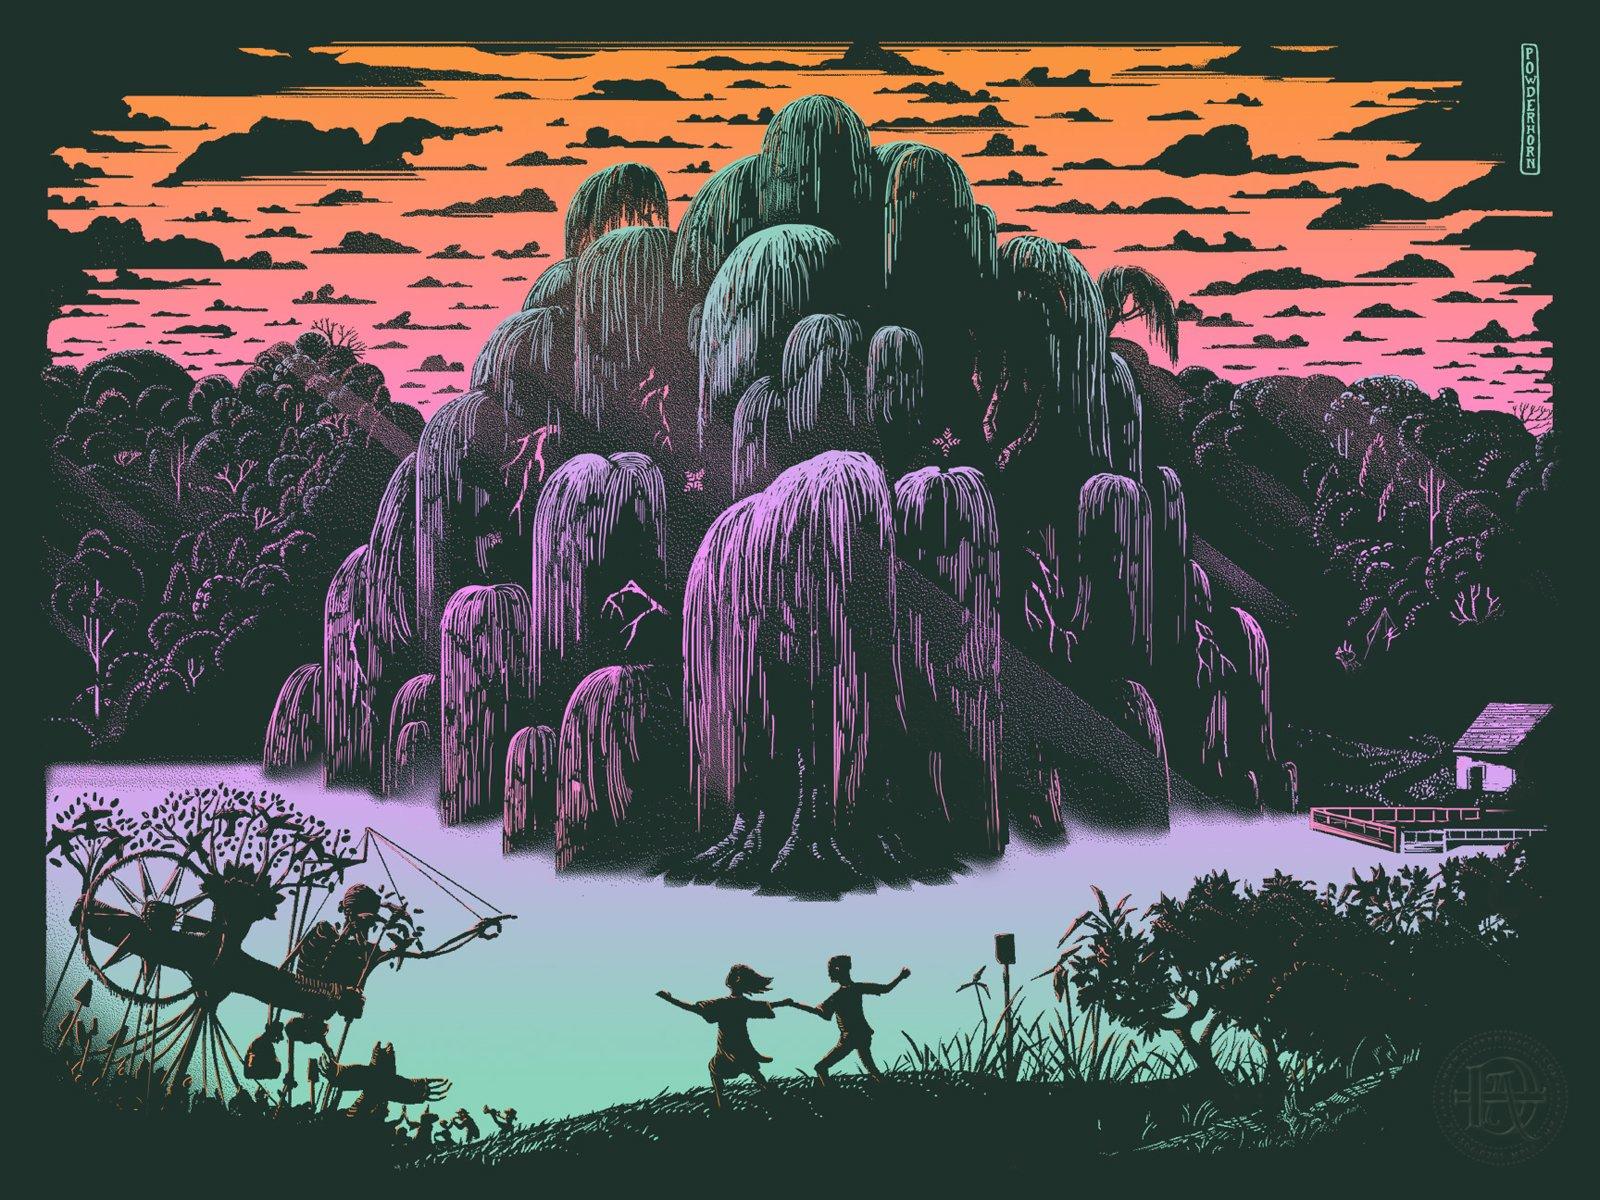 Spirits of Powderhorn poster by Lucas Richards